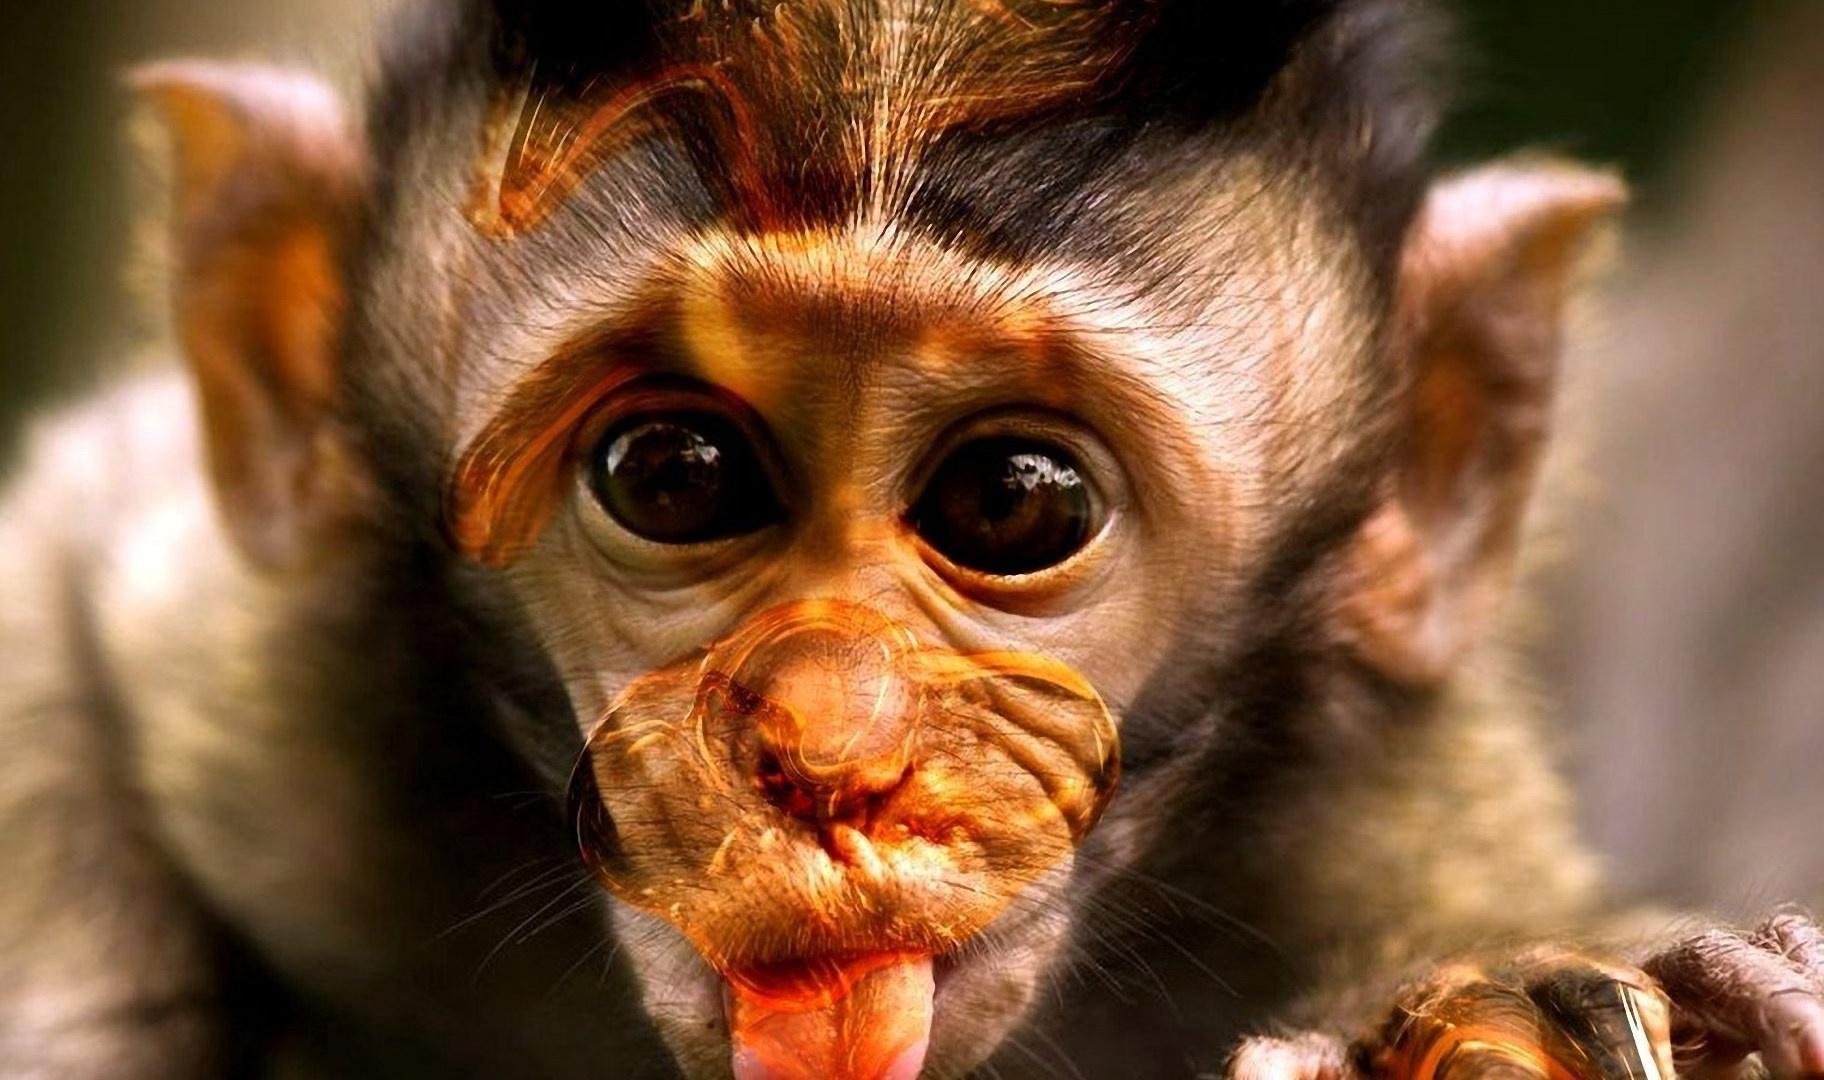 monkey baby gorilla HD wallpapers